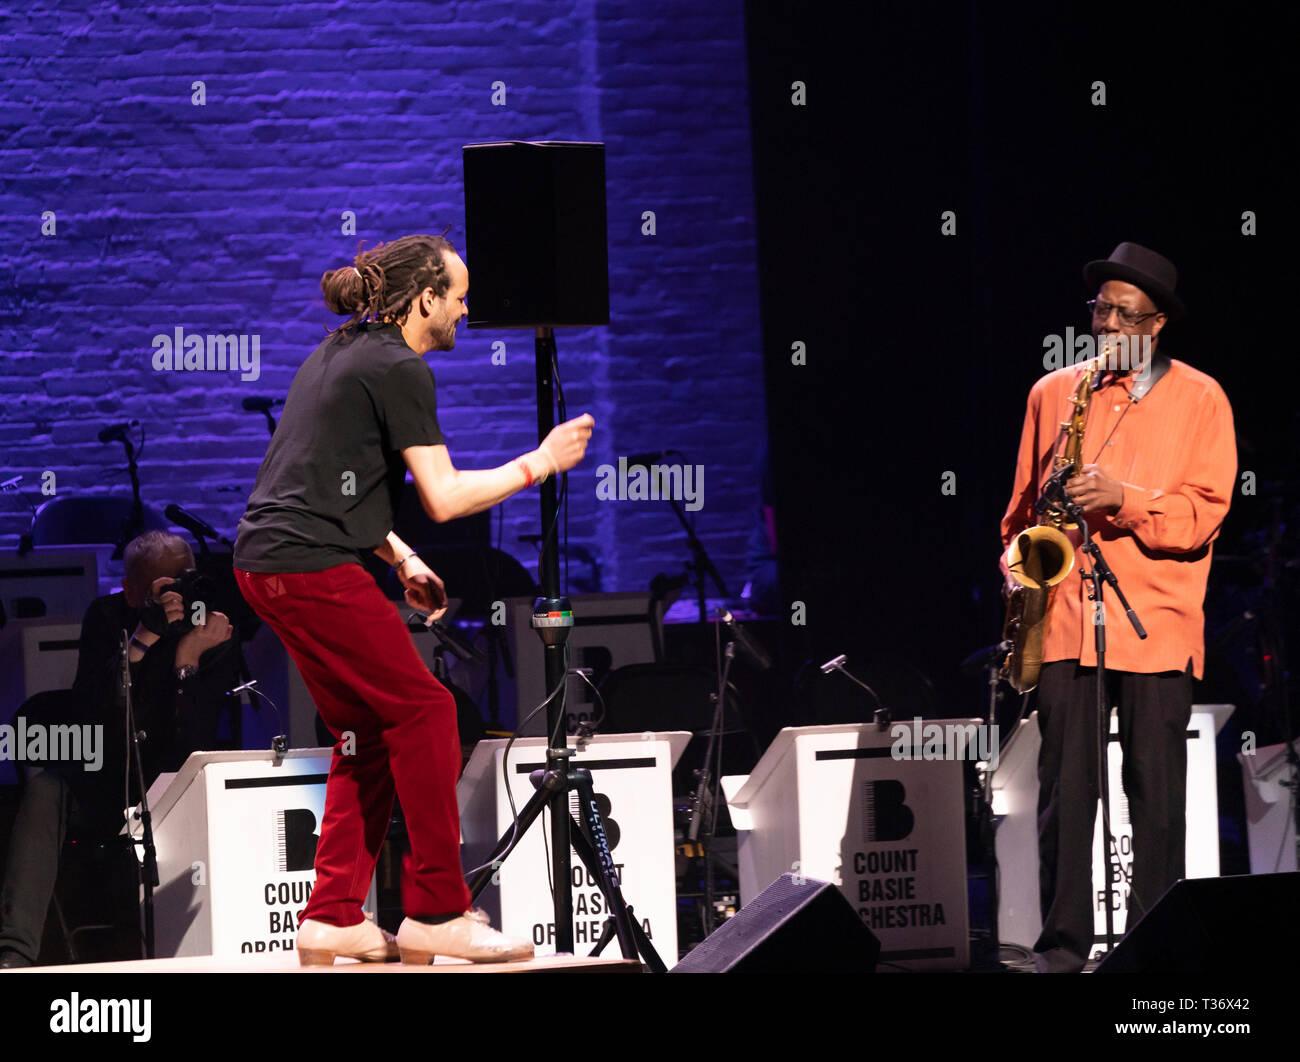 New York, NY - April 4, 2019: Savion Glover performs tap